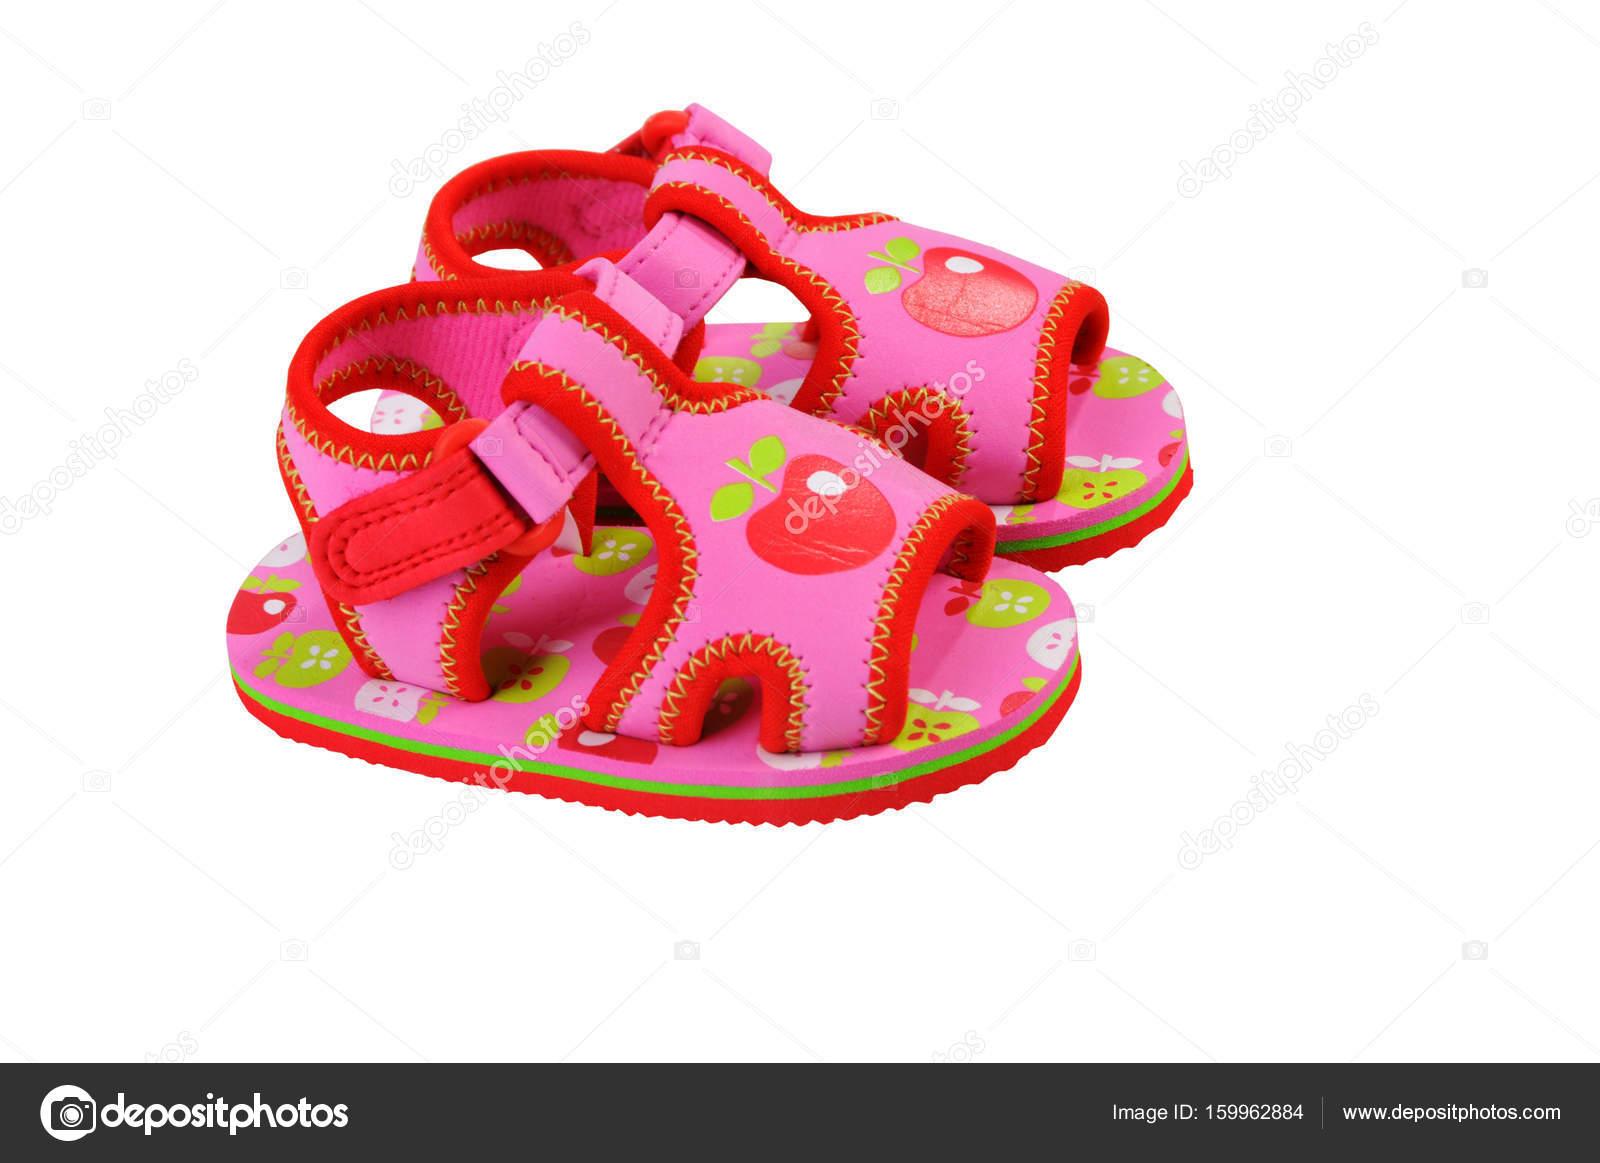 c67987b25ee Μωρουδιακά Παπούτσια. Σανδάλια για μωρά — Φωτογραφία Αρχείου · Πέδιλα Ροζ  baby.